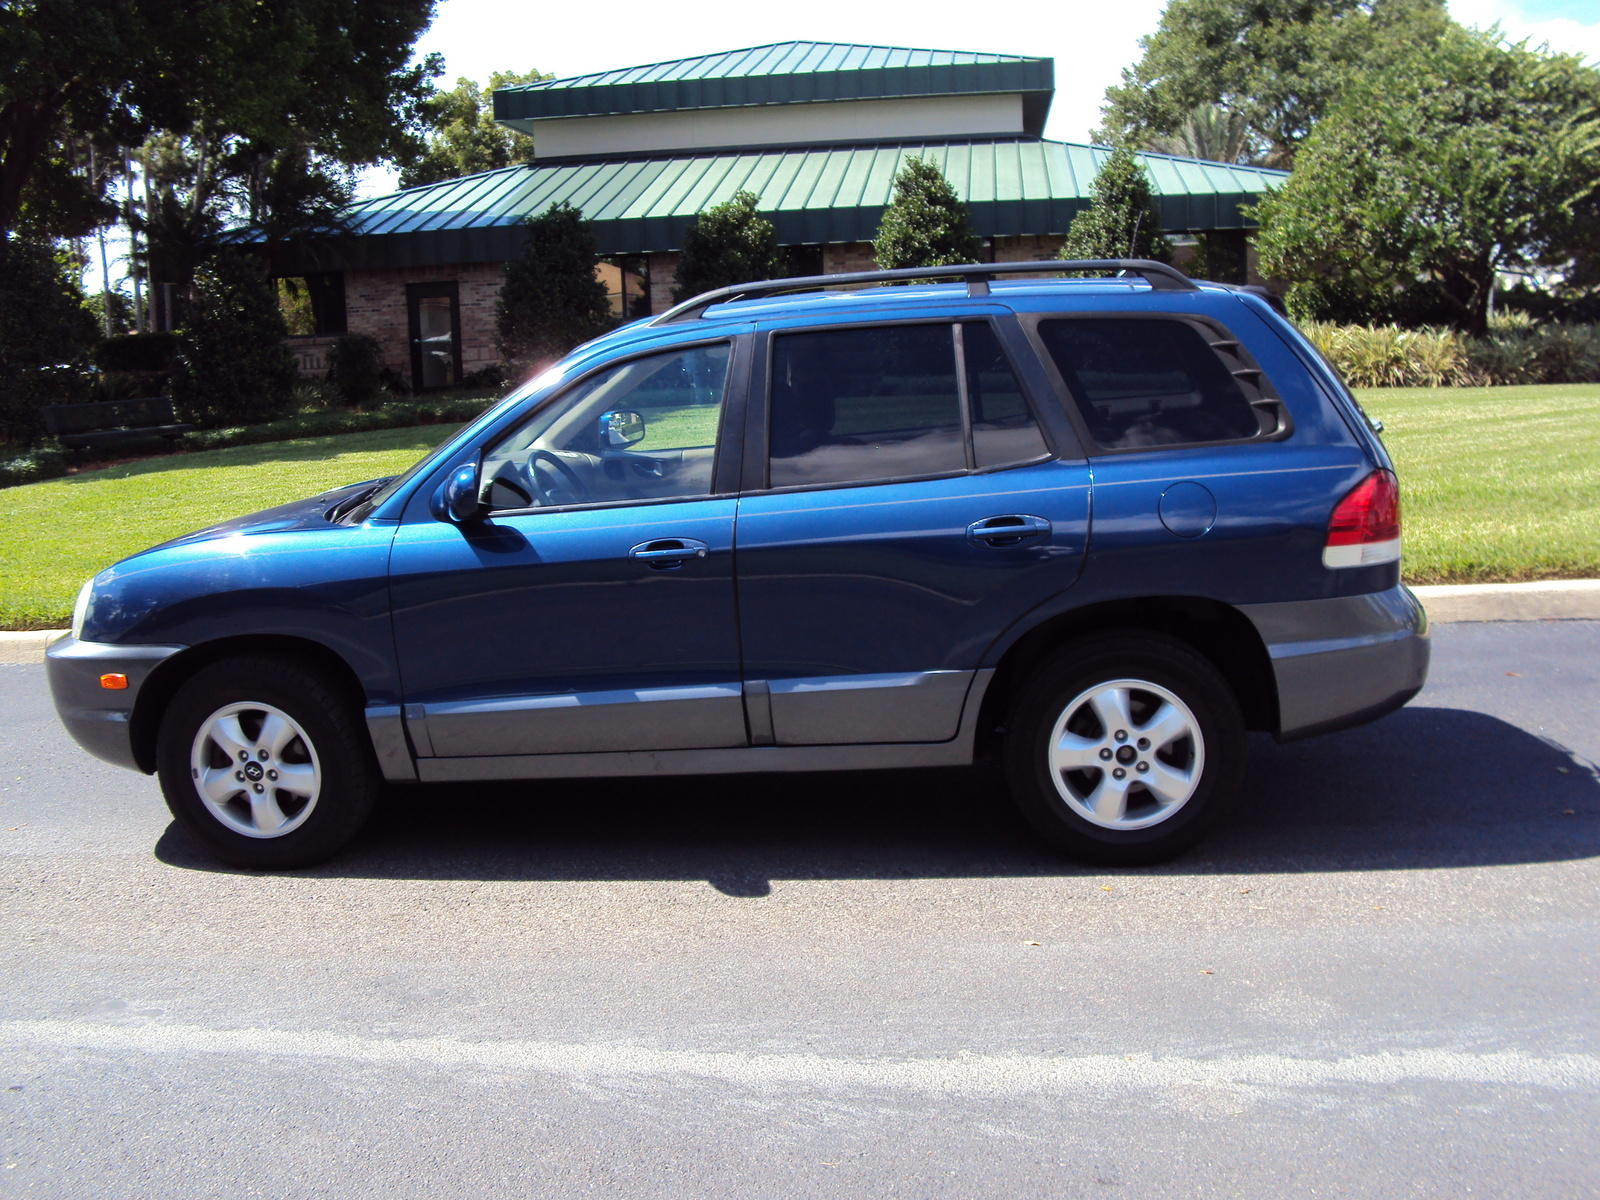 2006 Hyundai Santa Fe - Overview